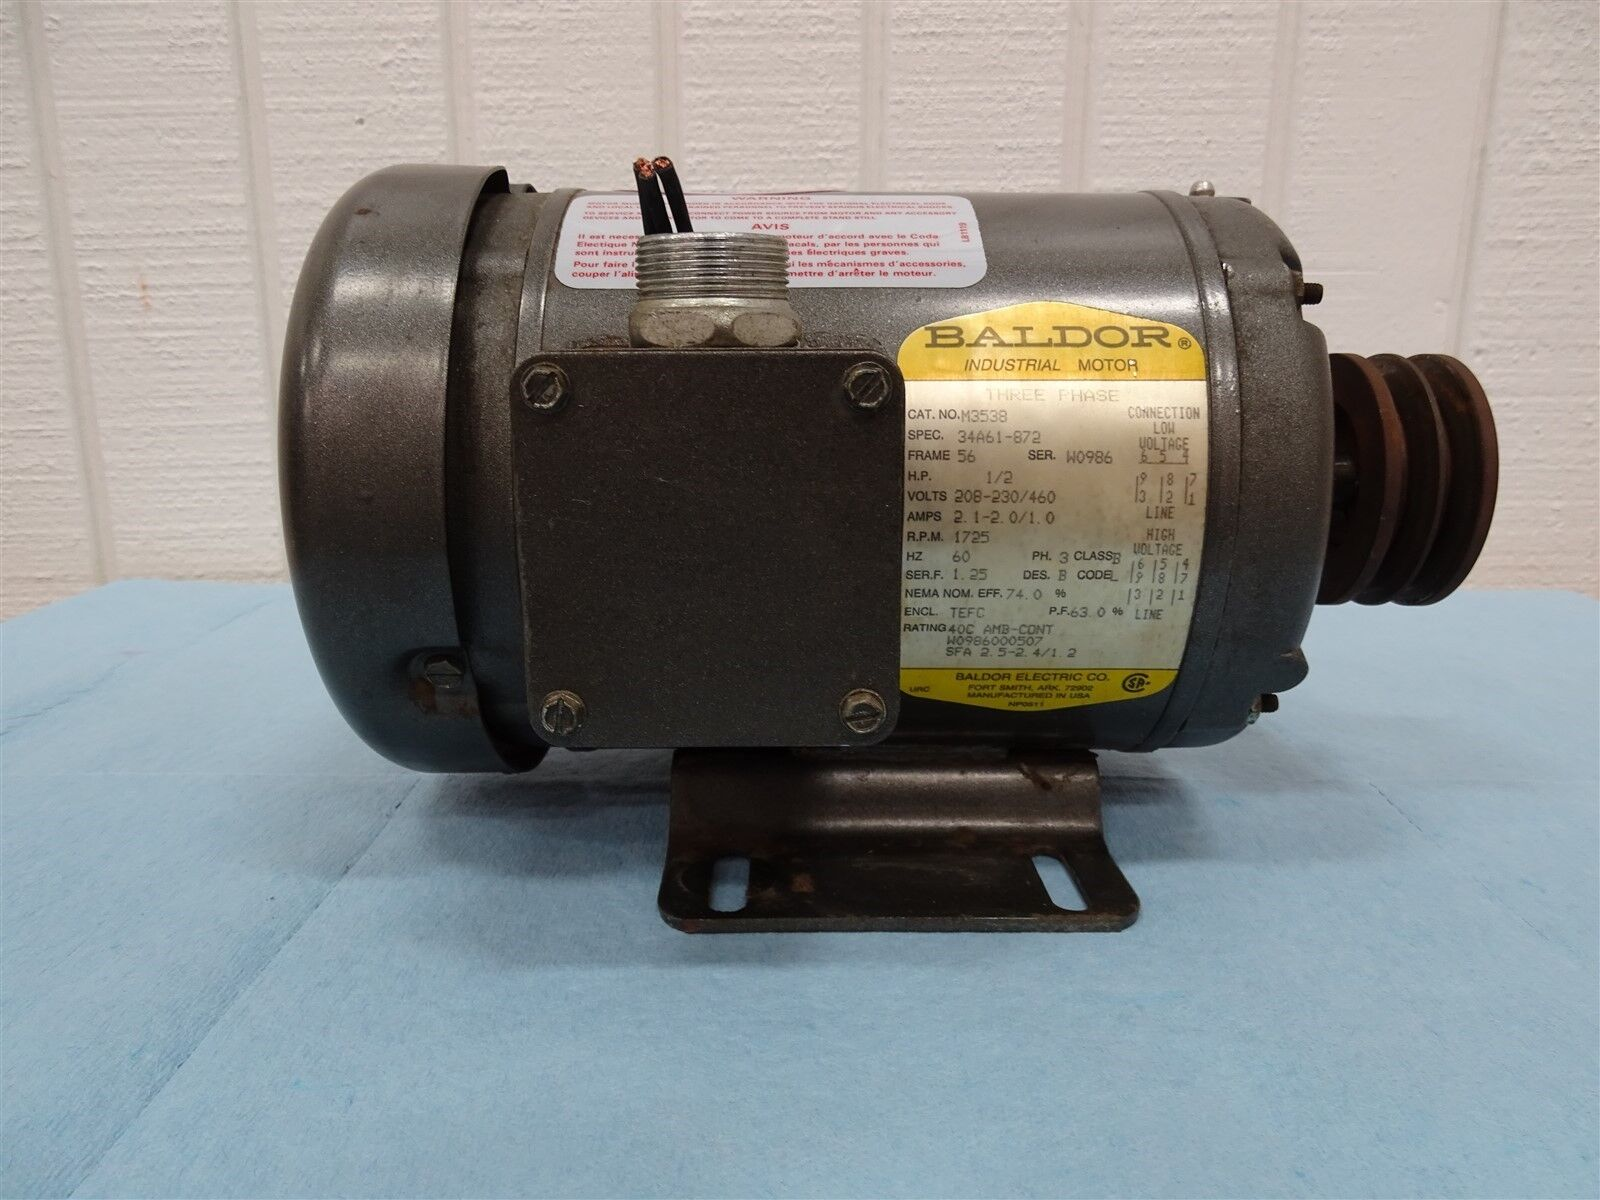 Baldor M3538 Industrial Motor 1/2HP 1725RPM Frame: 56 208-230/460V 60HZ 3PH